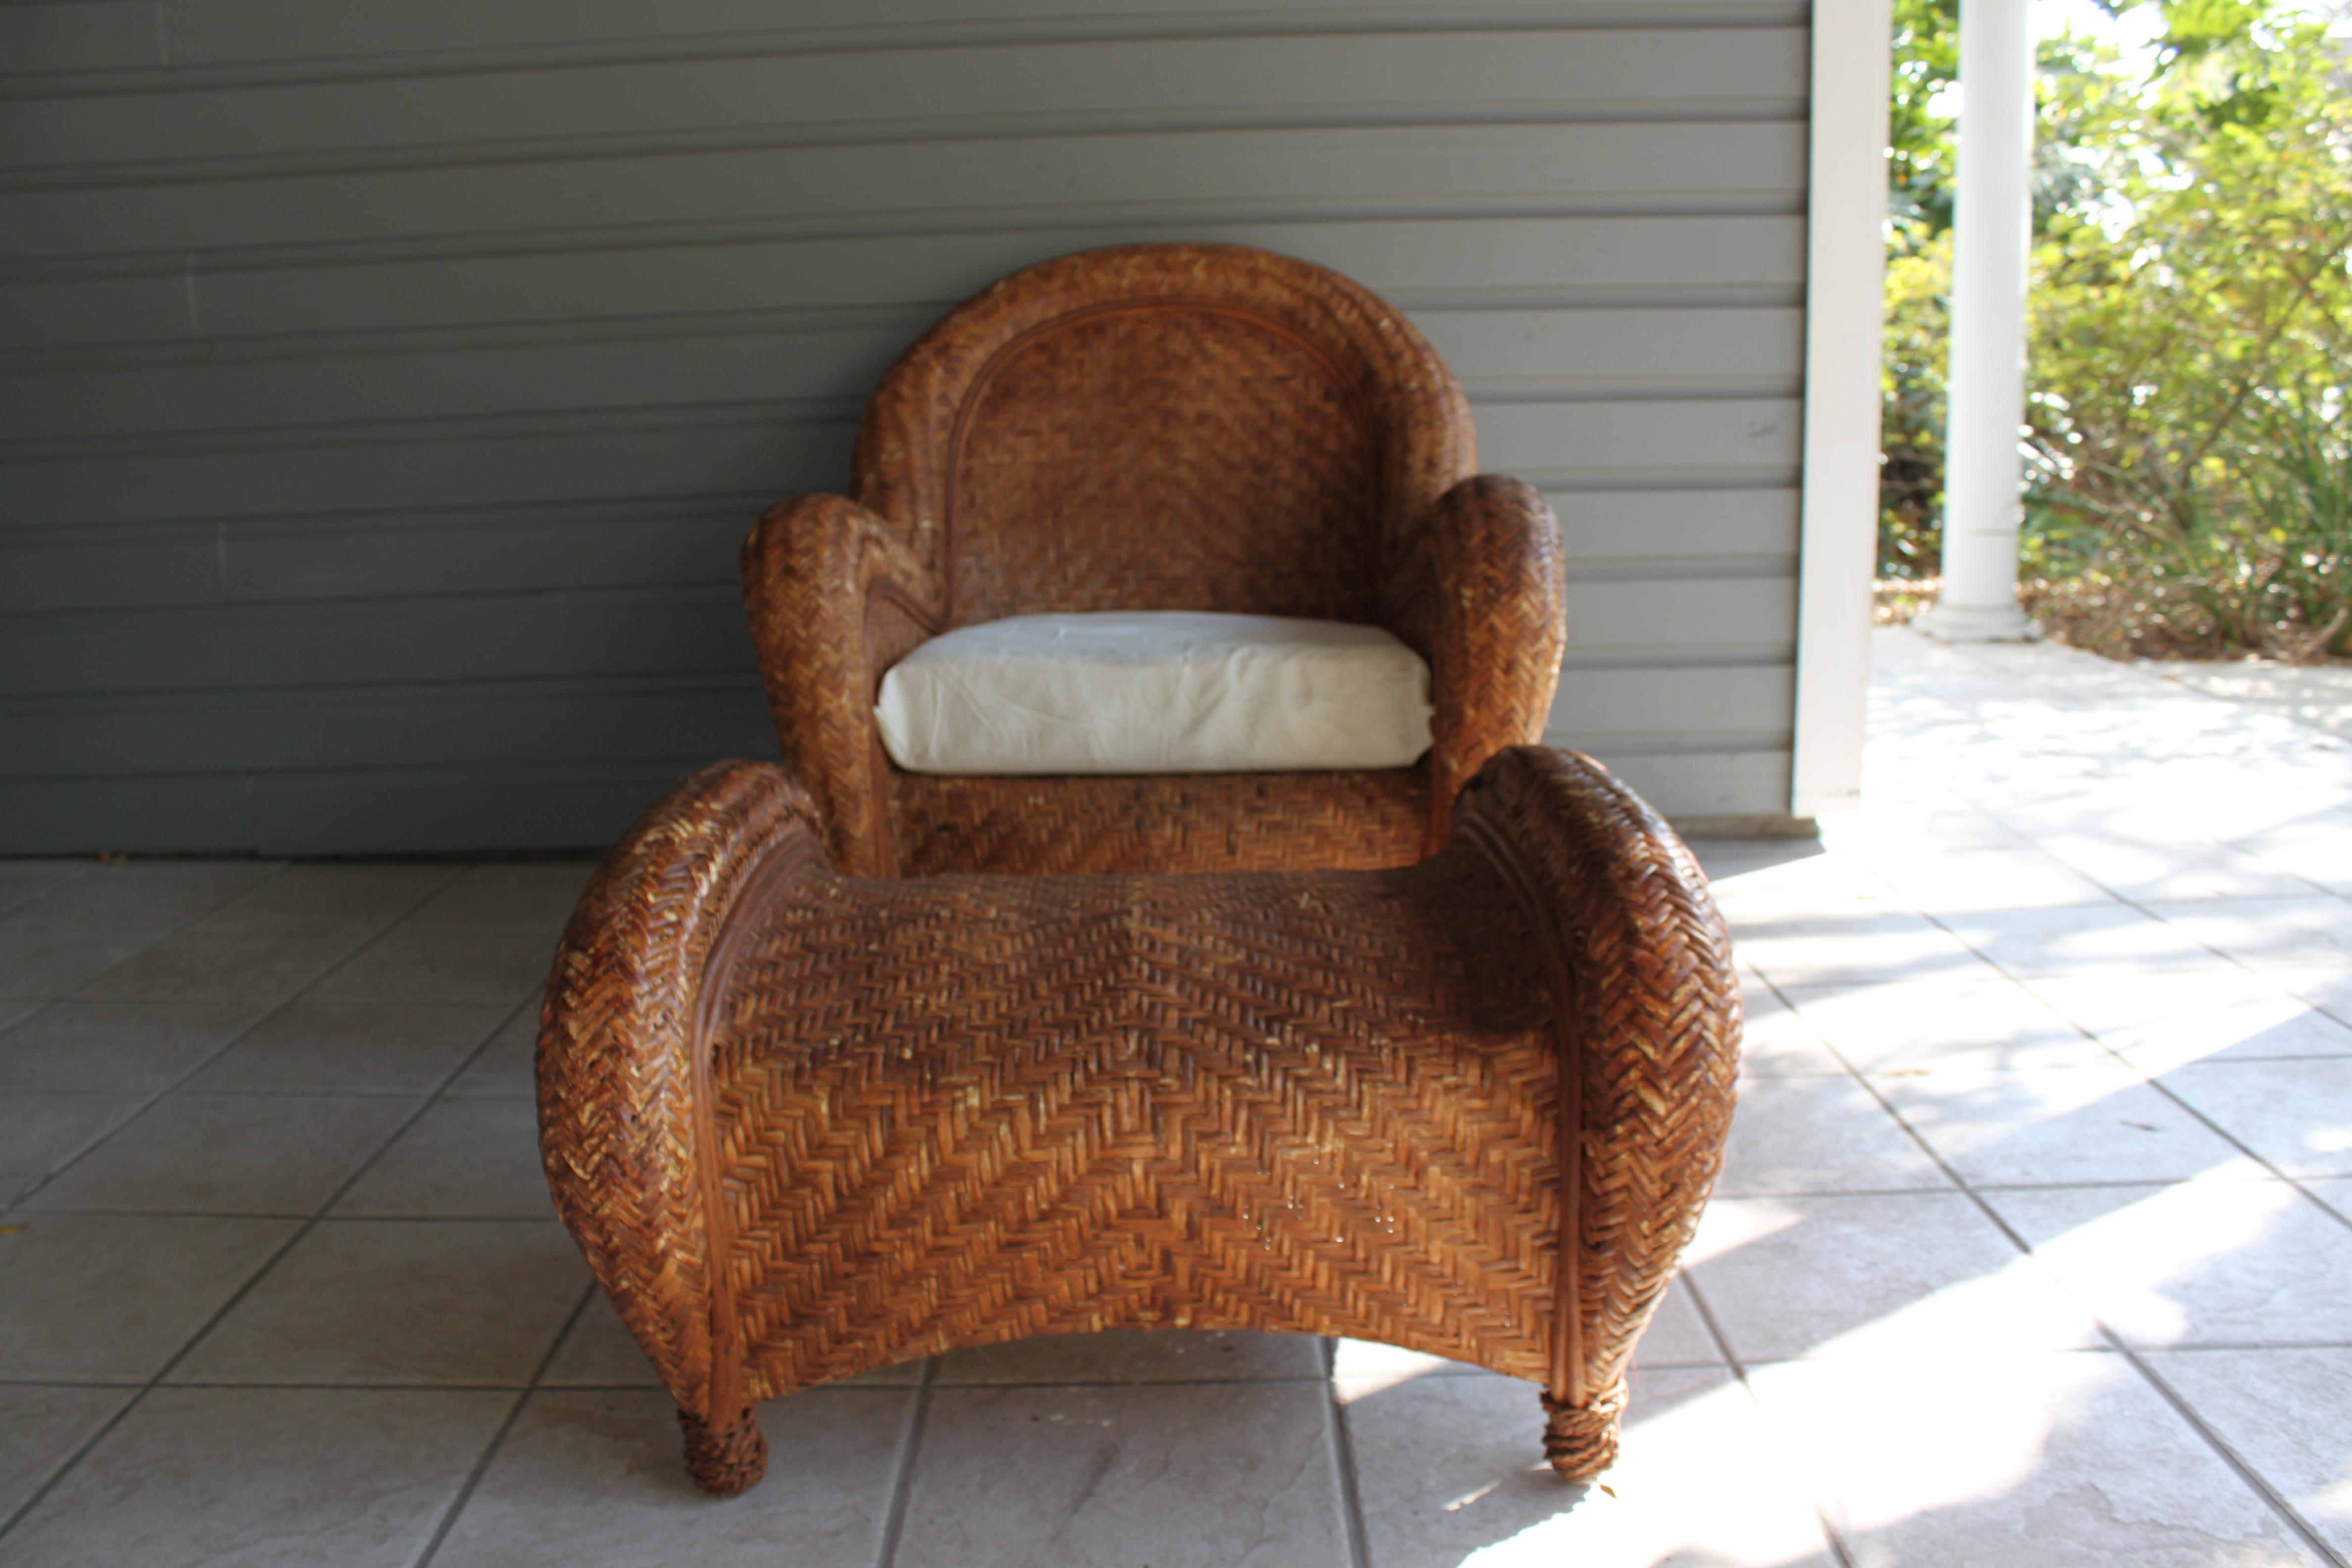 Superb Pottery Barn Rattan Malabar Chair U0026 Ottoman   Image 2 ...